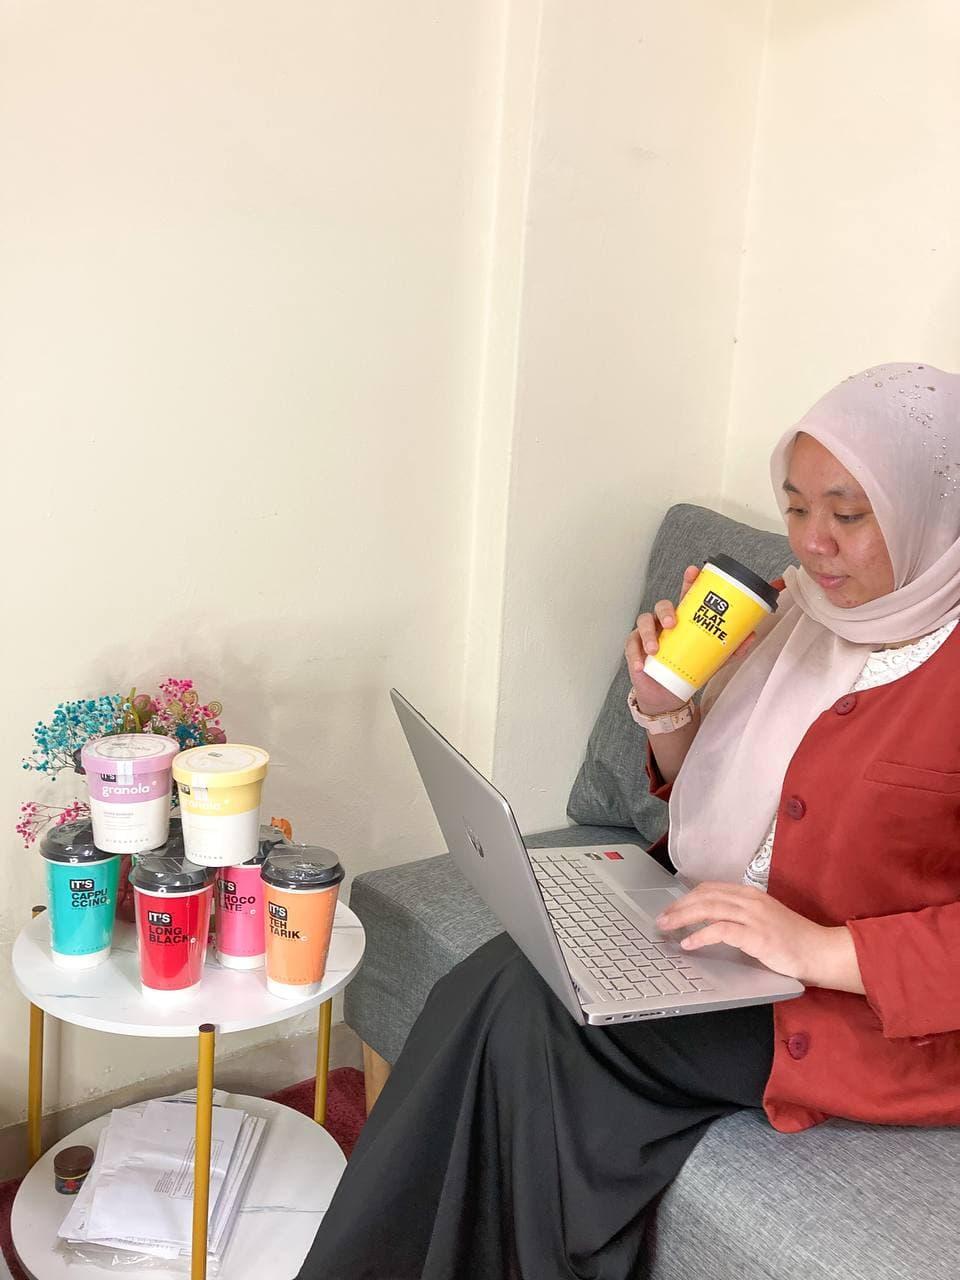 IT's Series Variasi Kopi by Aik Cheong's Sedap & Mudah di Buat